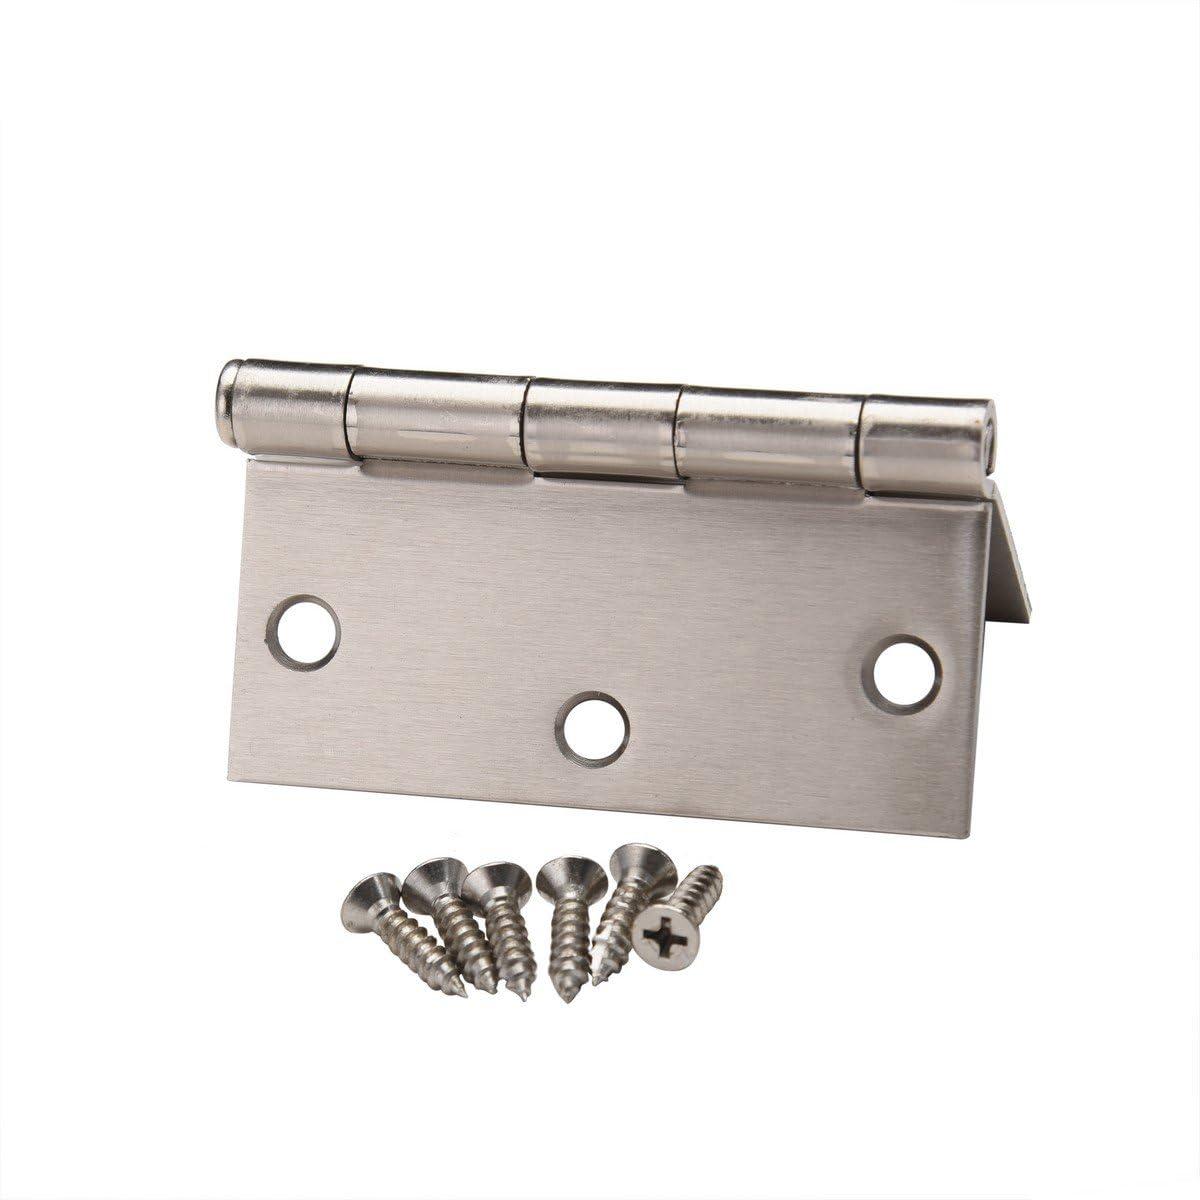 Pack of 24 East West Consolidated 61968 3.5 Square Edge SN Satin Nickel Steel Door Hinge